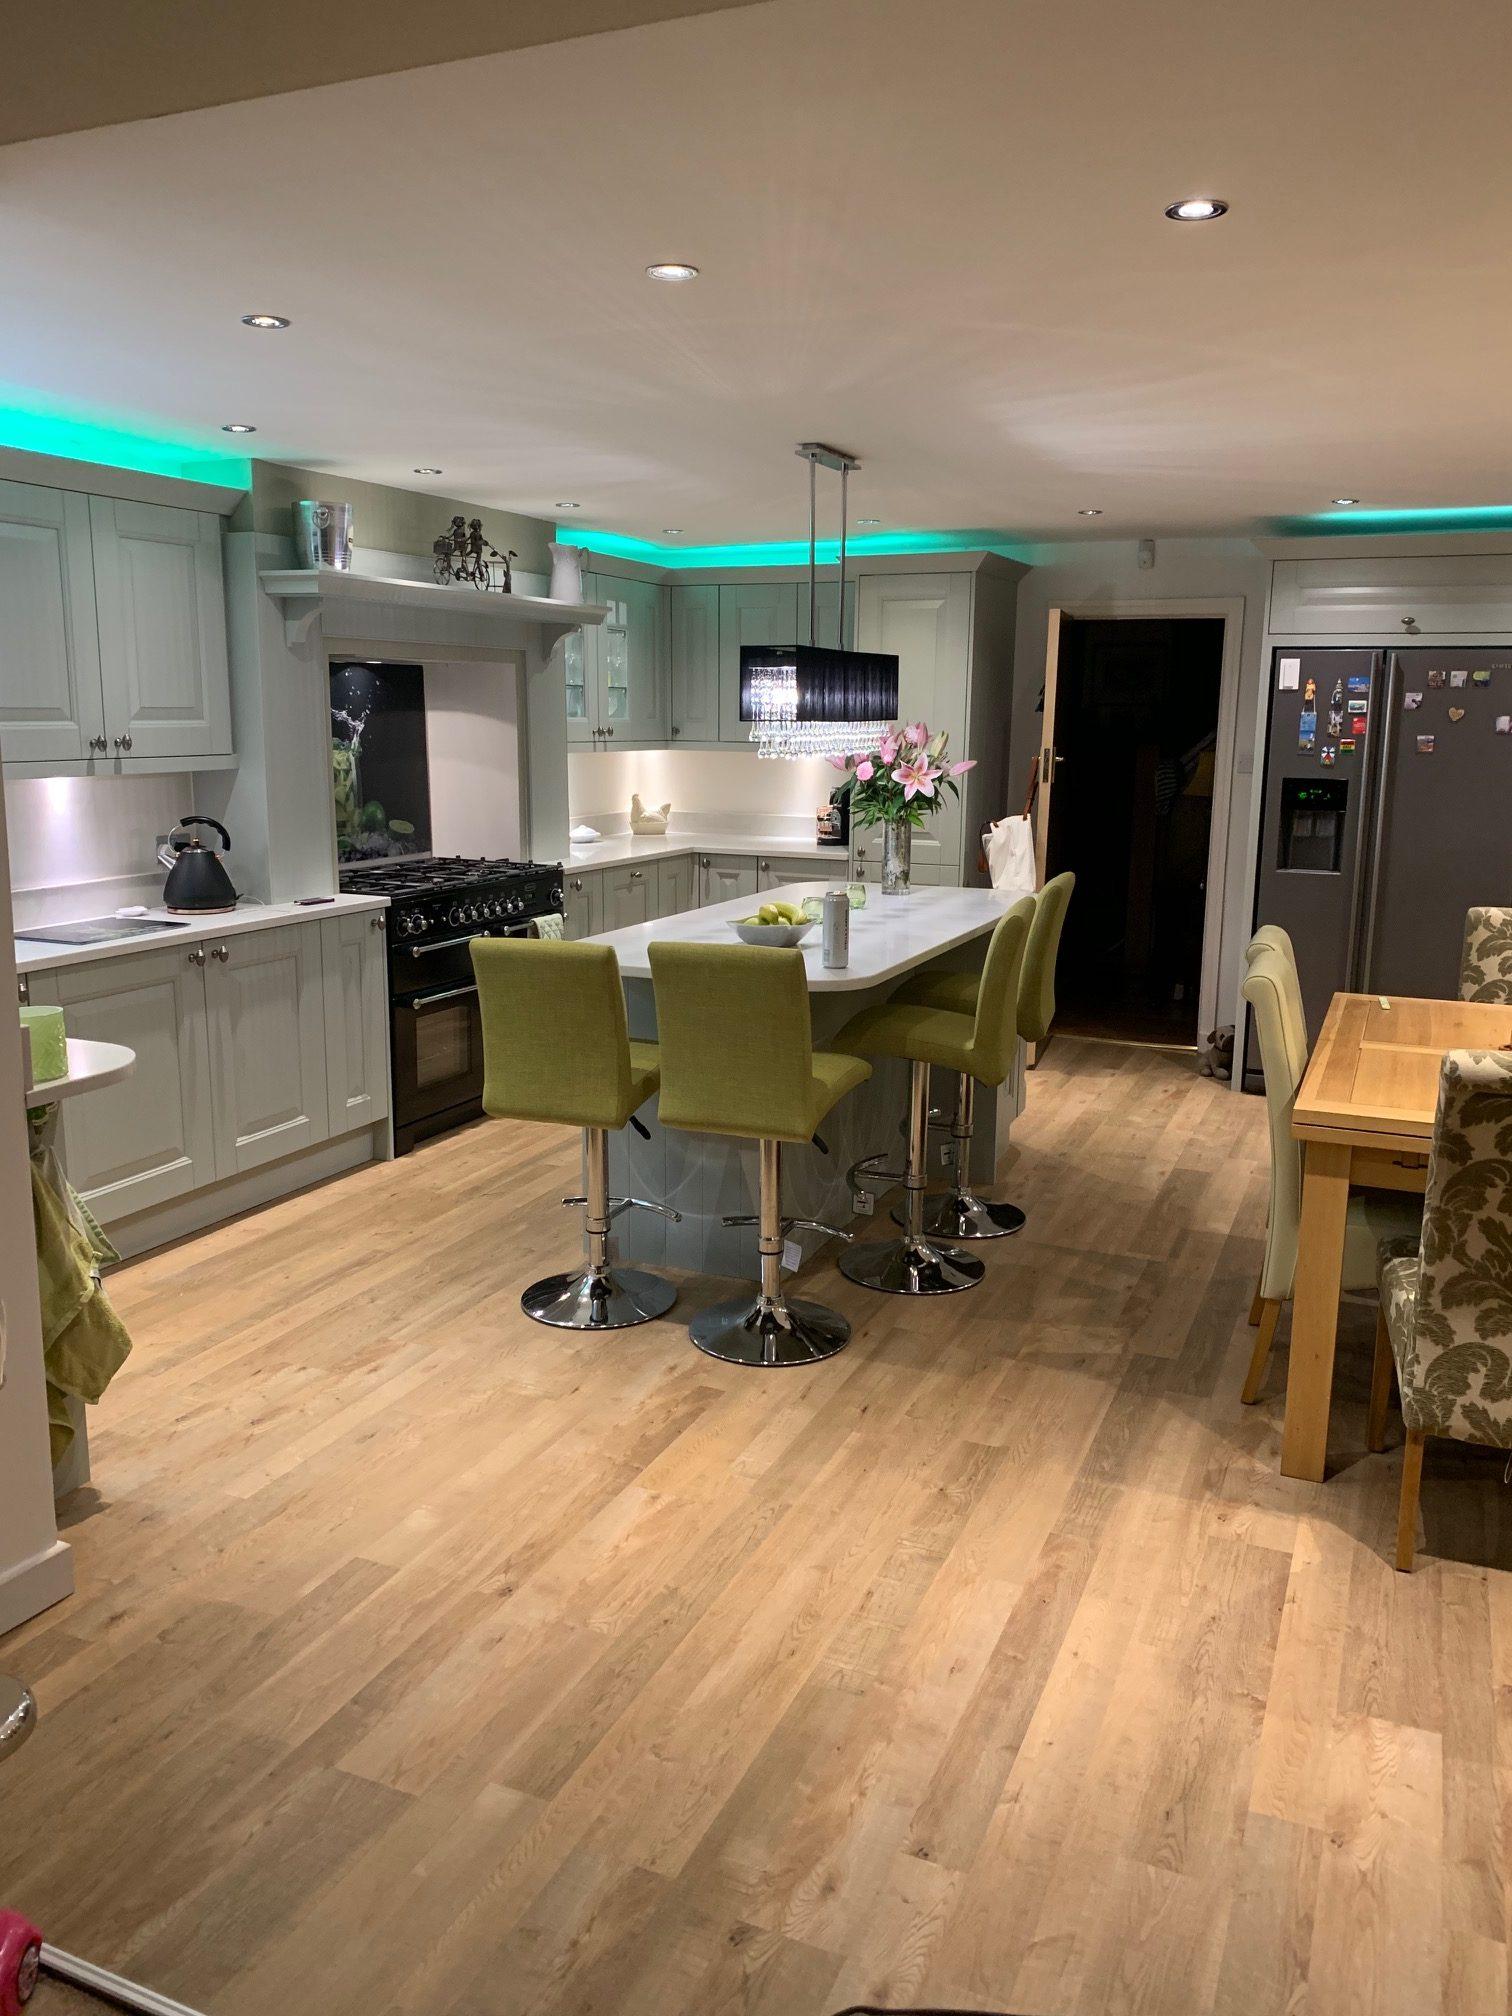 poynton_cheshire_house_refurbishment_1-e1563027322392